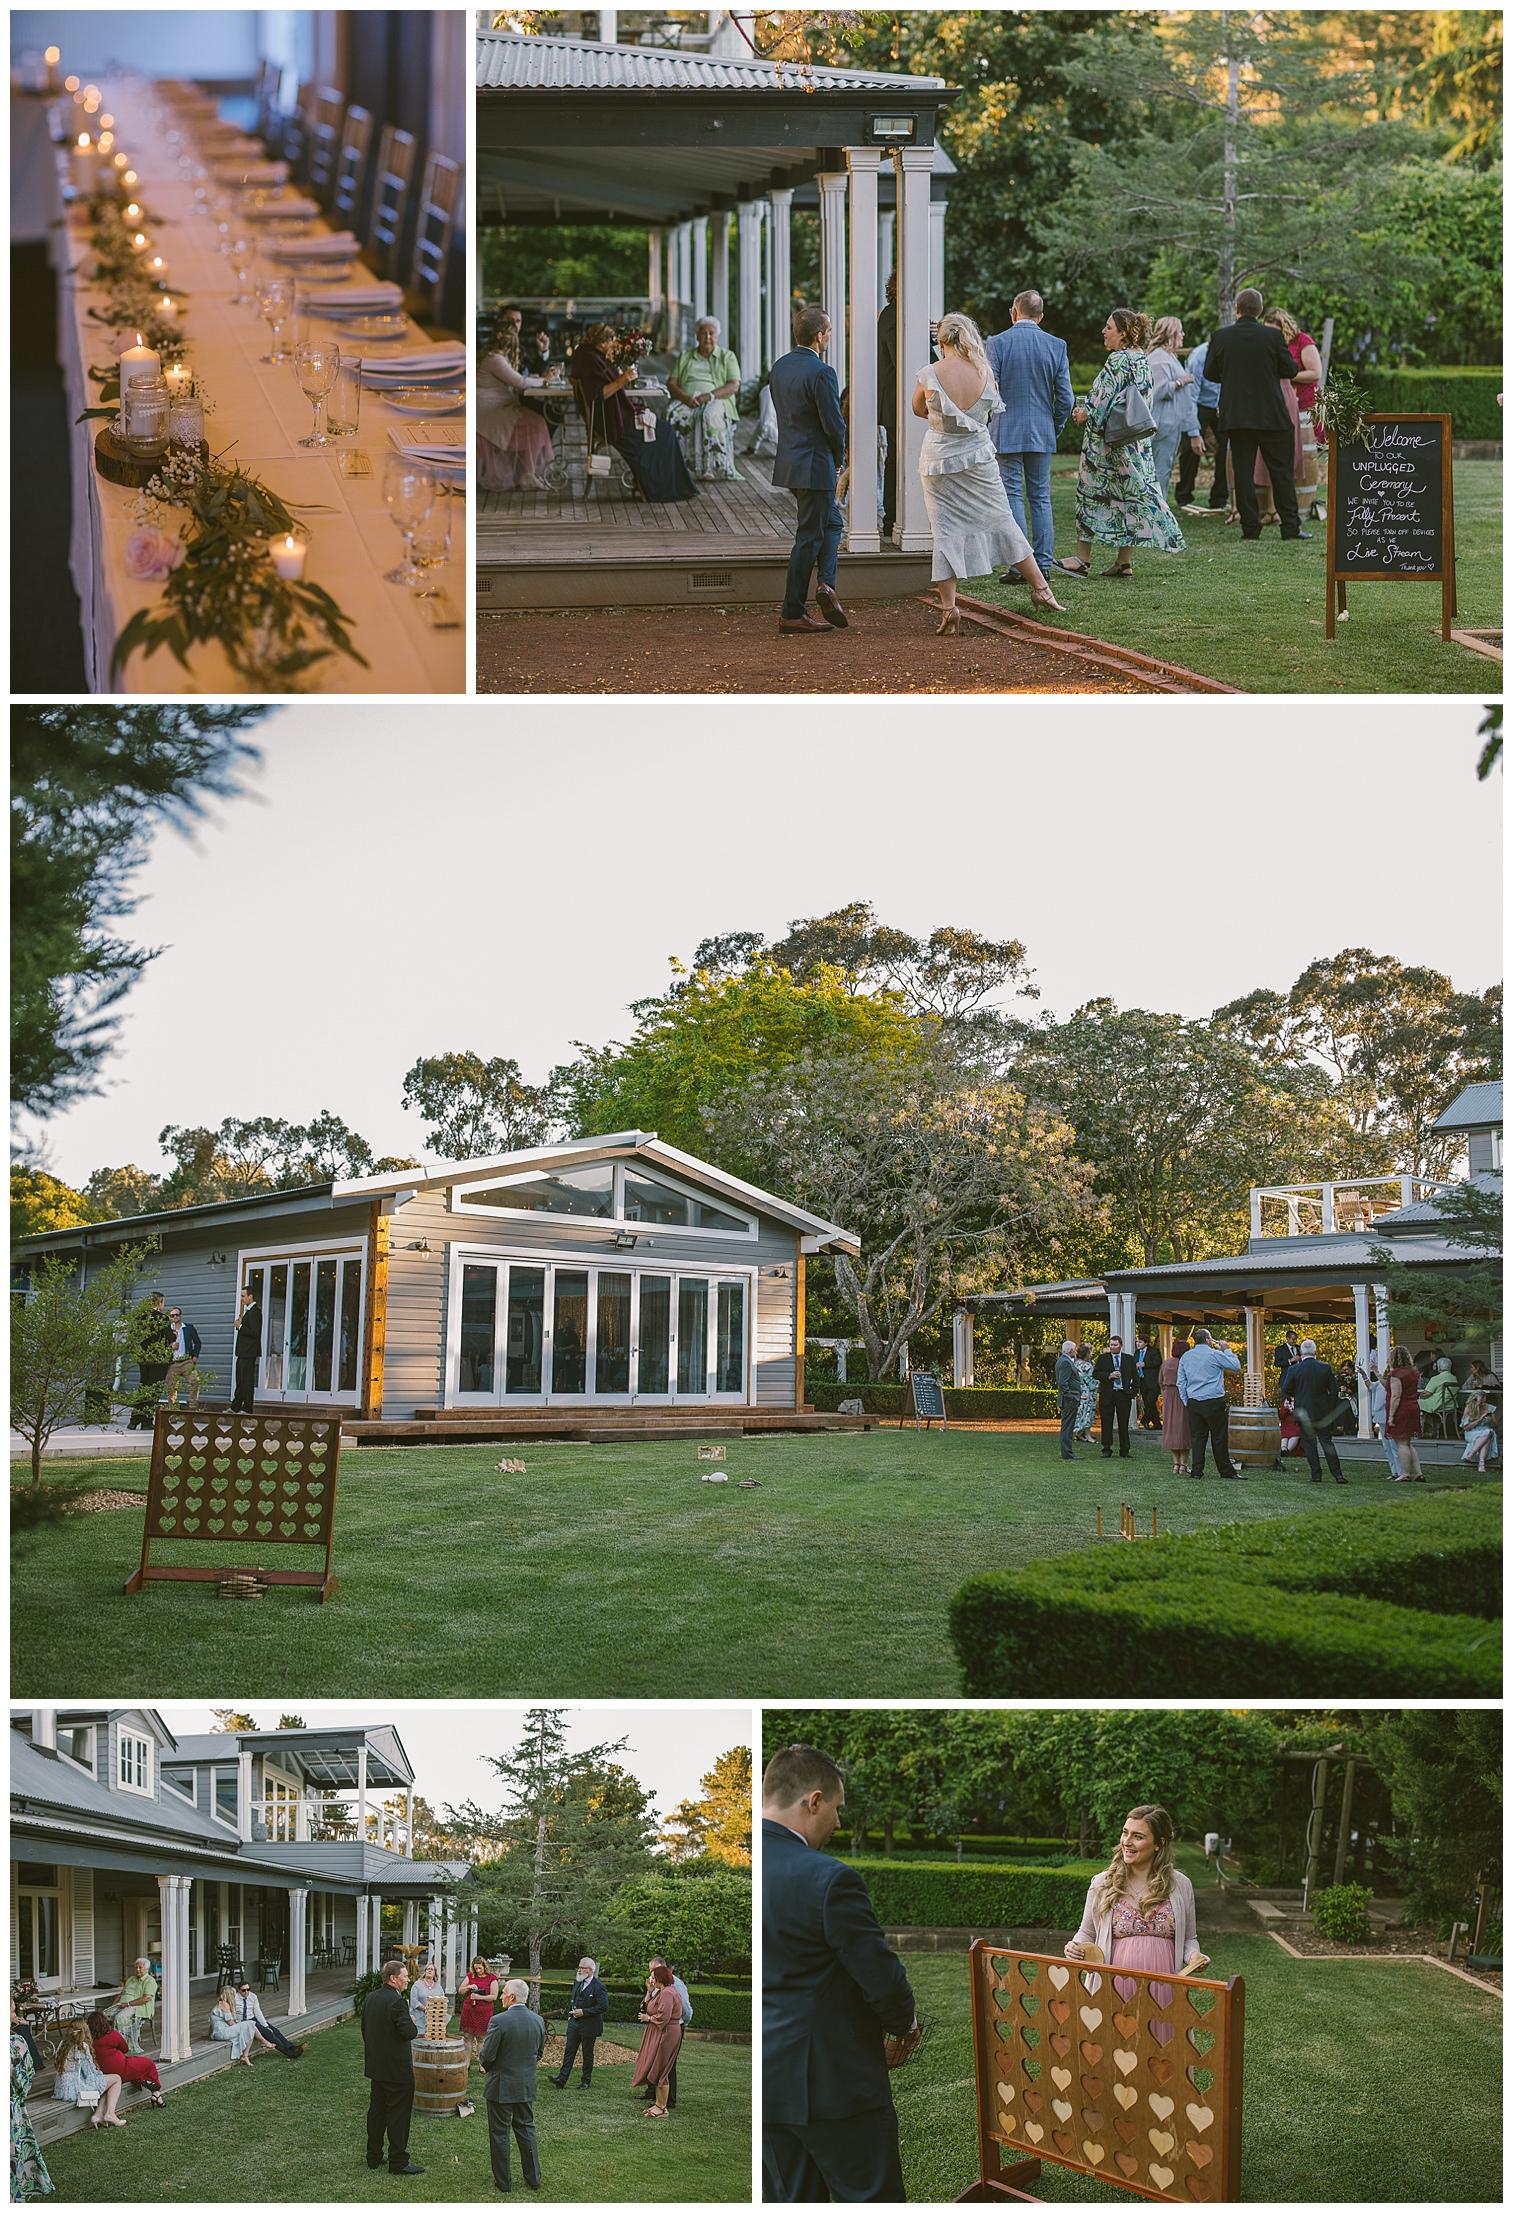 kalinya estate wedding, kalinya estate facilities